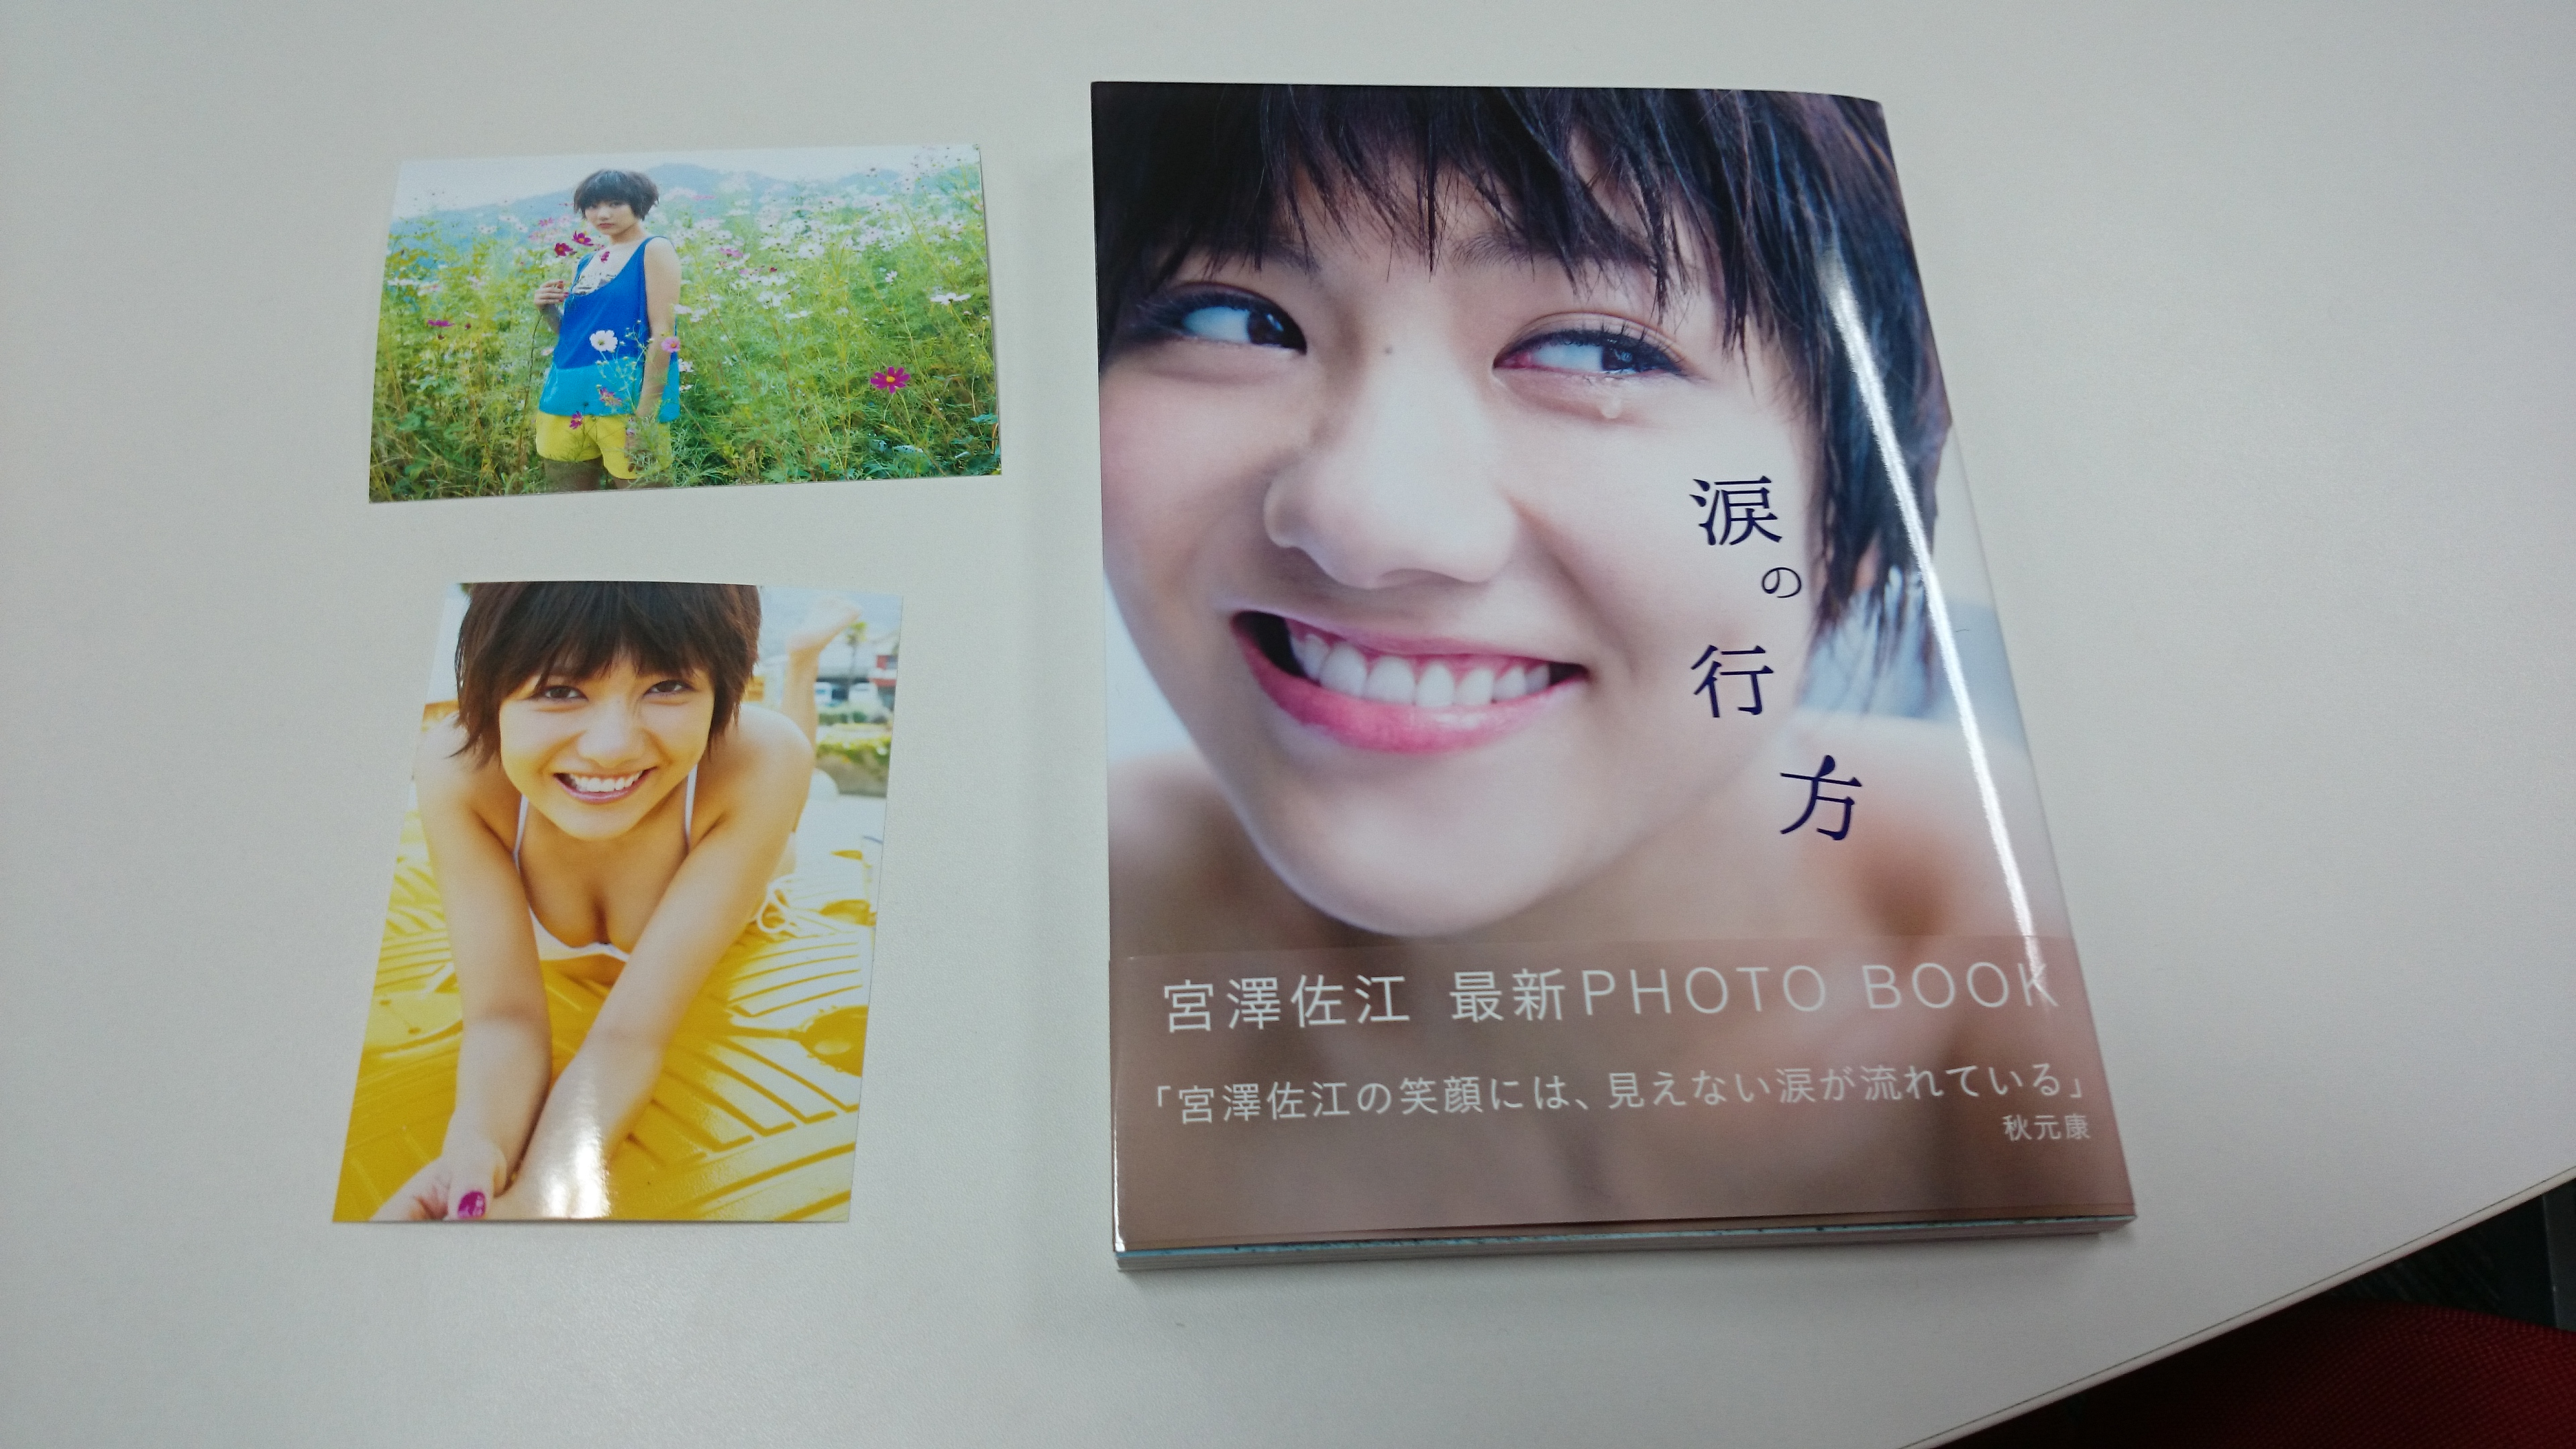 SNH48宮澤佐江ちゃんの『フォトブック「涙の行方」』発売記念握手会へ行ってきた